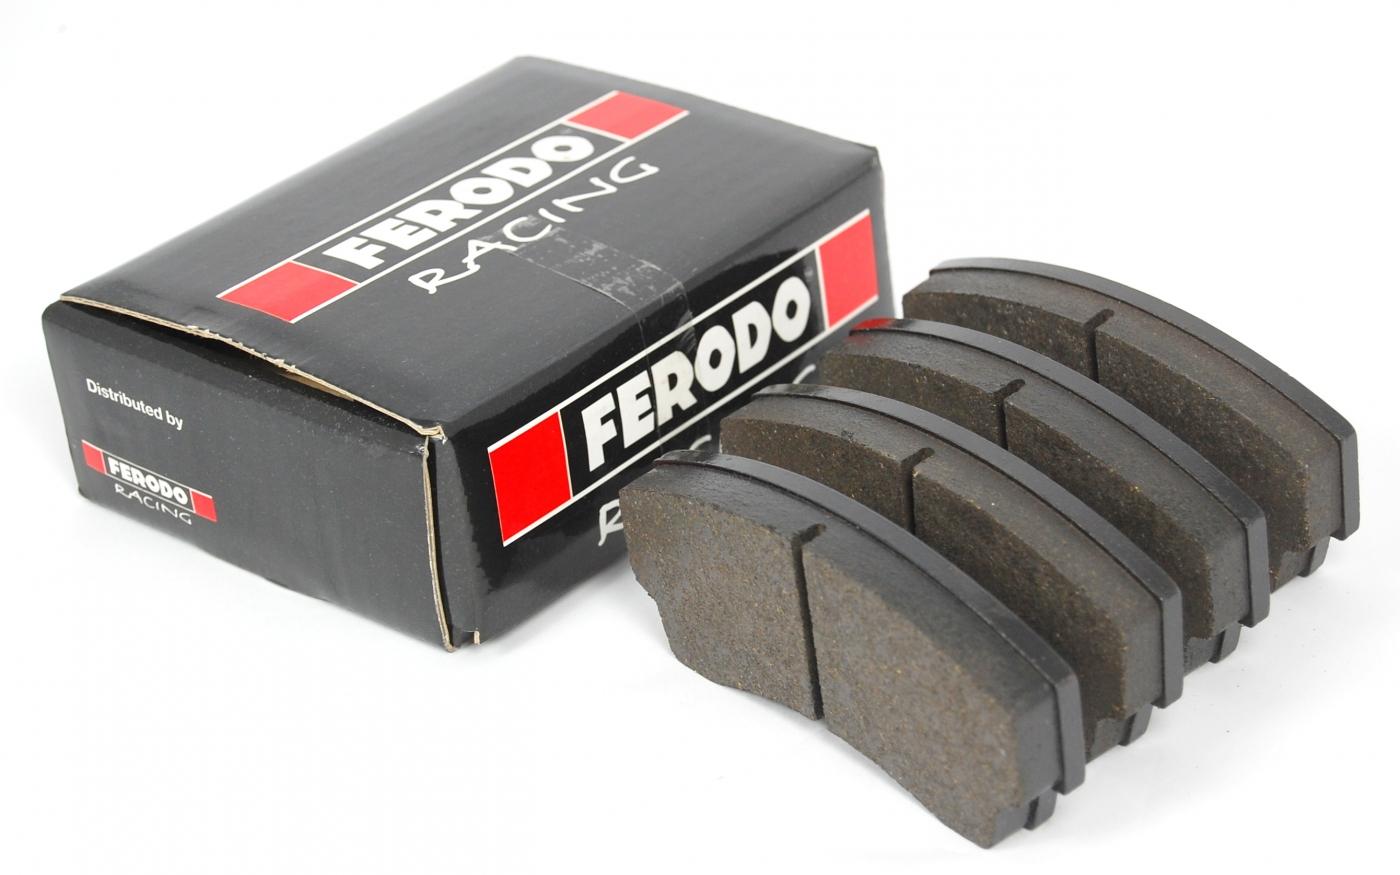 Brake_Pads_-_6_Pots_-_Ferodo_DS3000_1400_875_s_c1